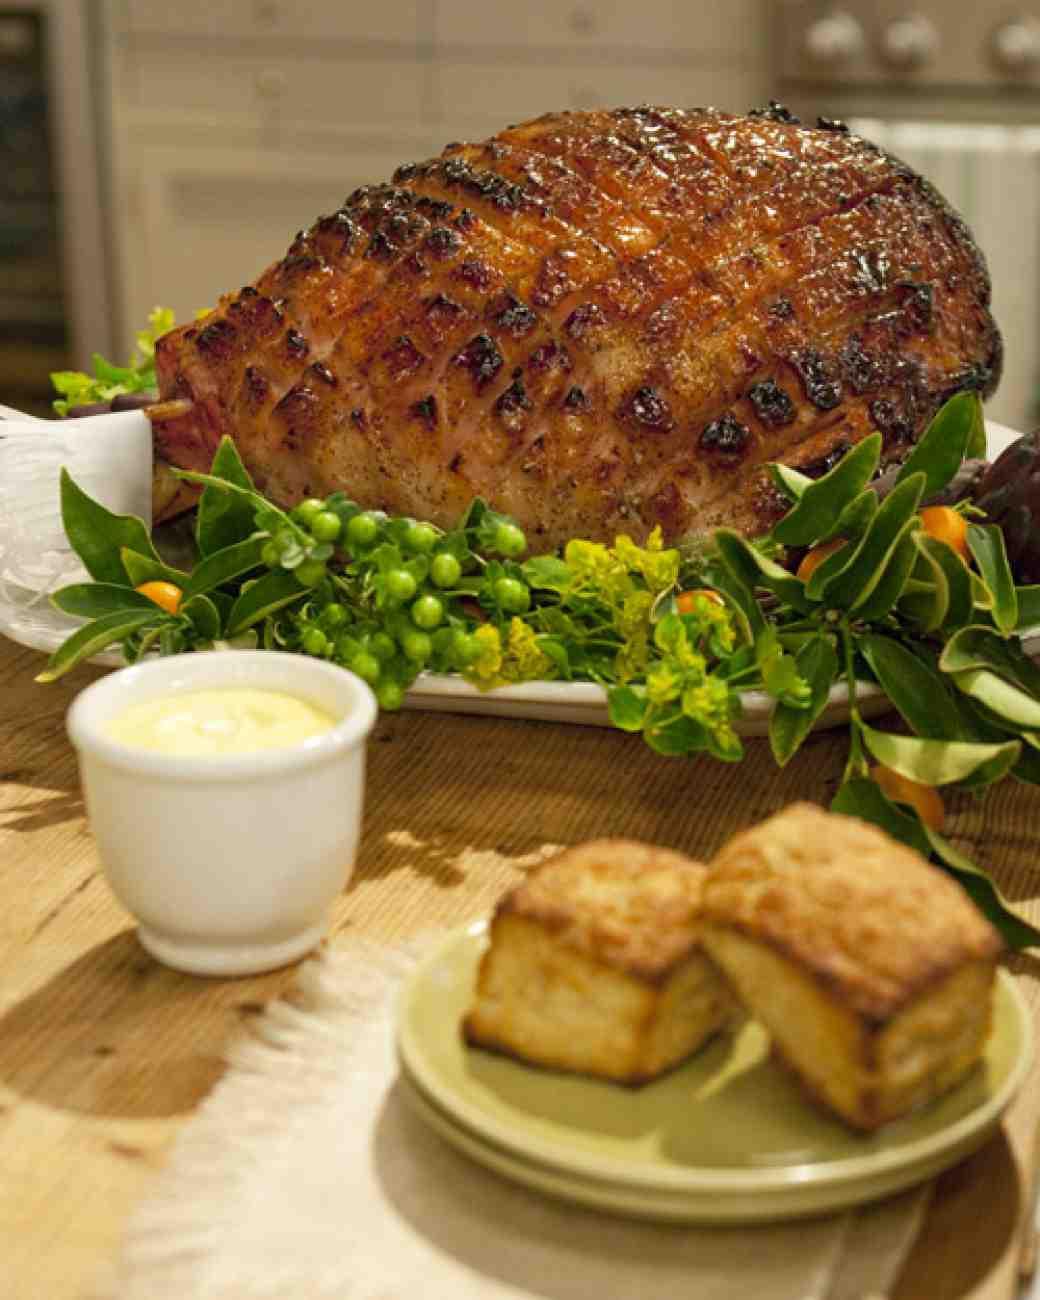 Easter Dinner Ideas Martha Stewart  Mustard Maple Glazed Ham Recipe & Video